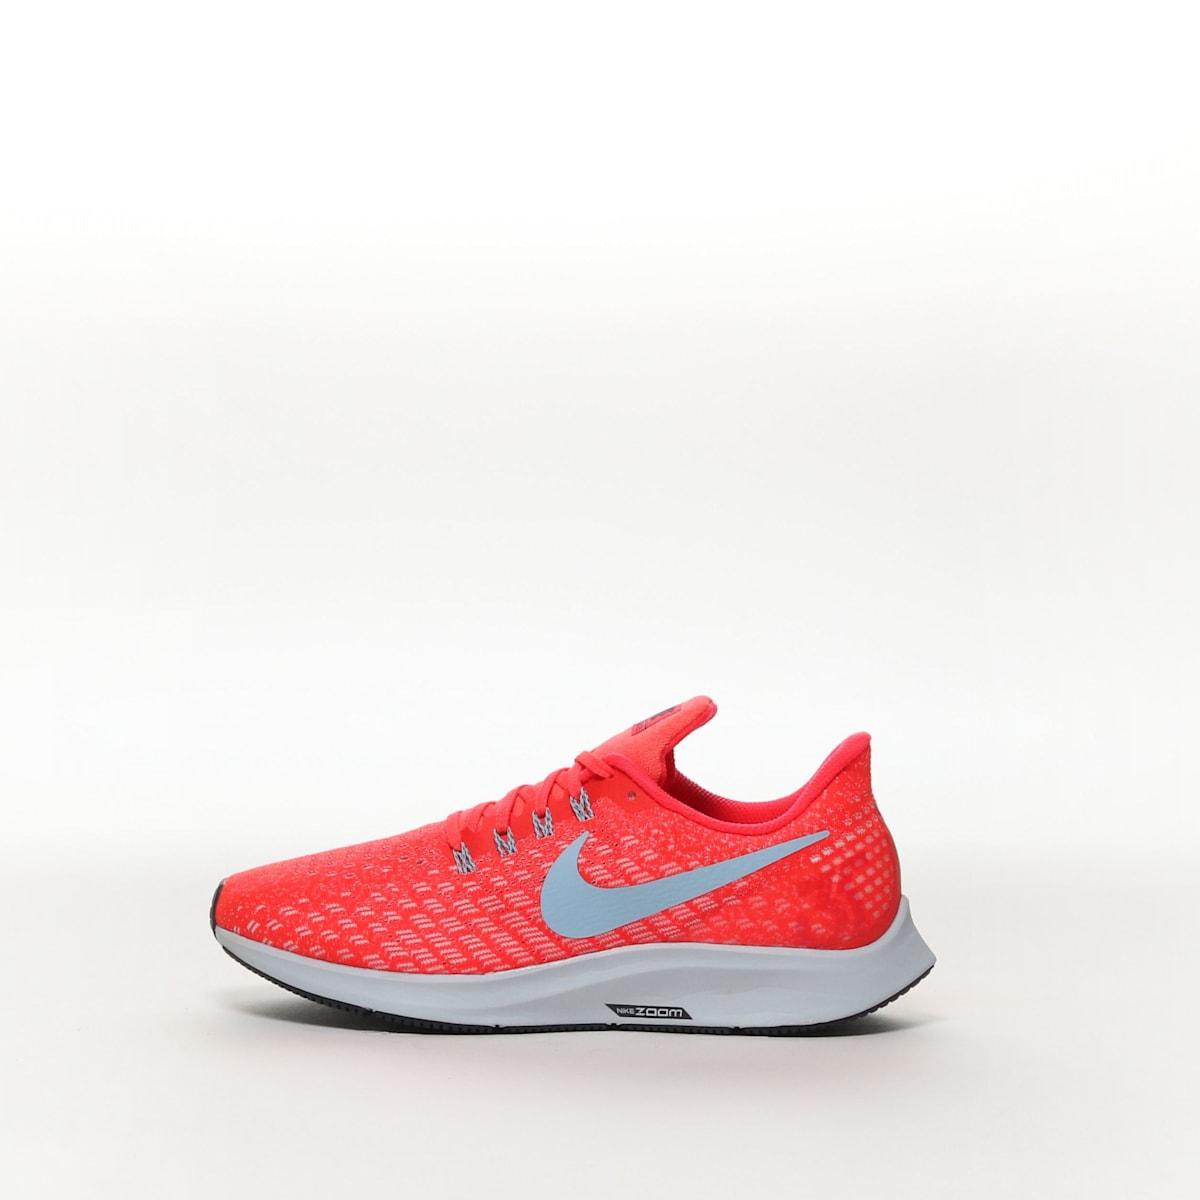 7edf01132de0a Nike Air Zoom Pegasus 35 - BRIGHT CRIMSON GYM RED FOOTBALL GREY ...